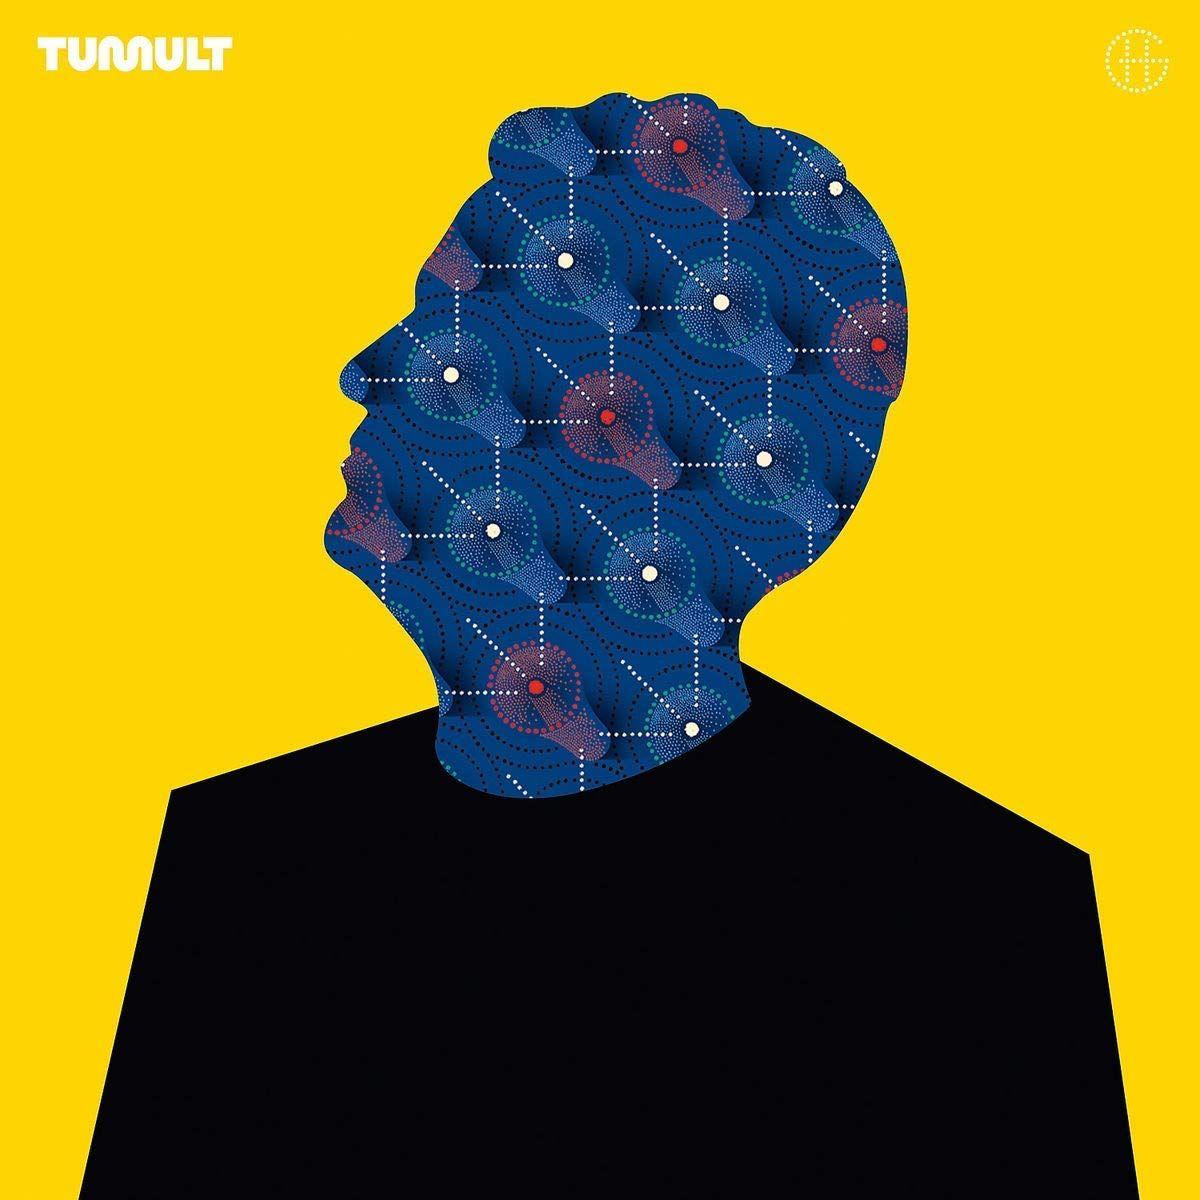 Herbert Grönemeyer - Tumult album cover